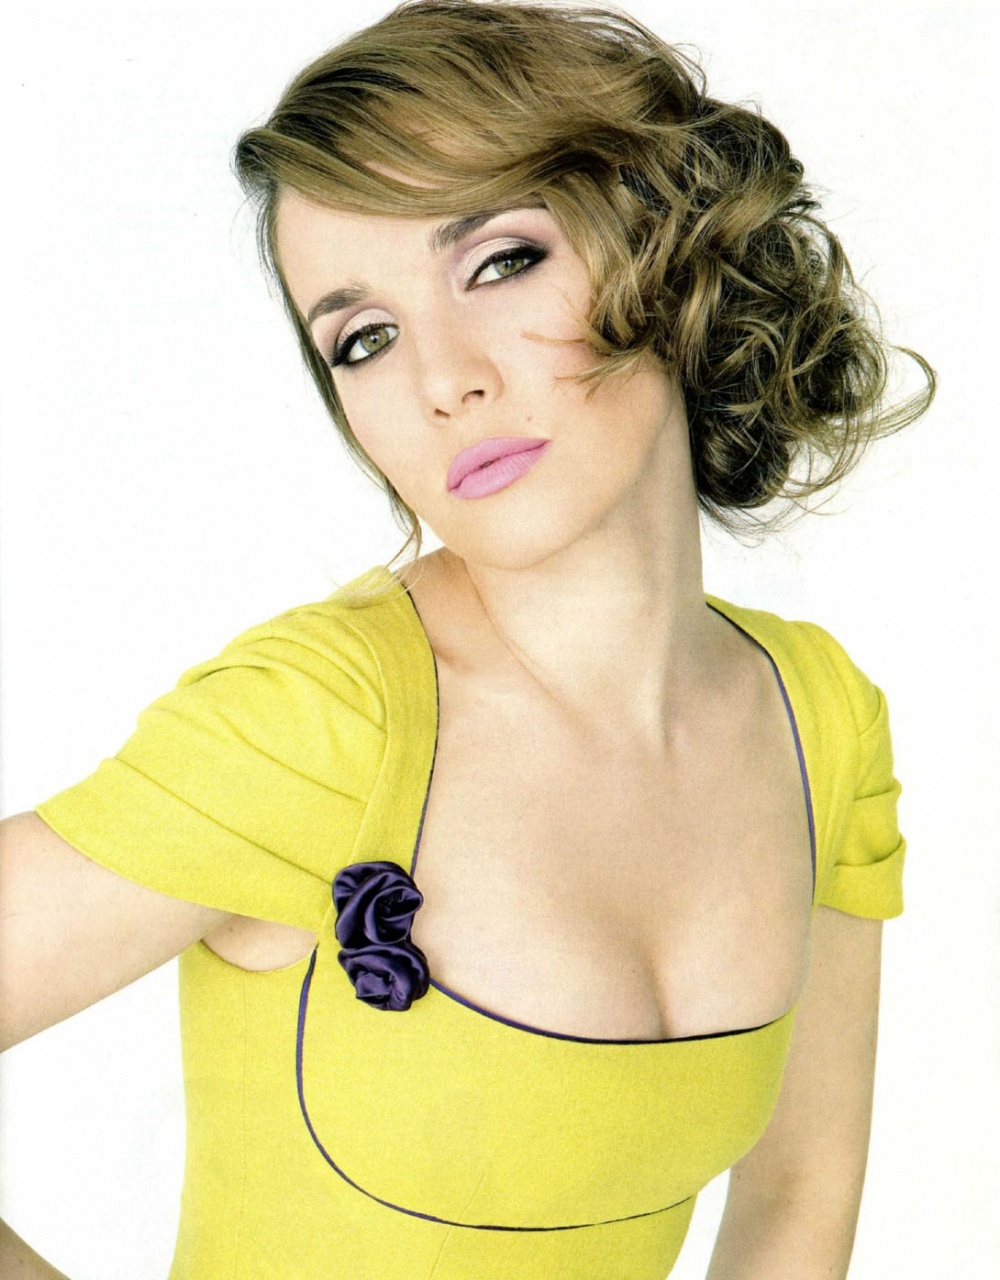 Наталья Орейро (Natalia Oreiro)